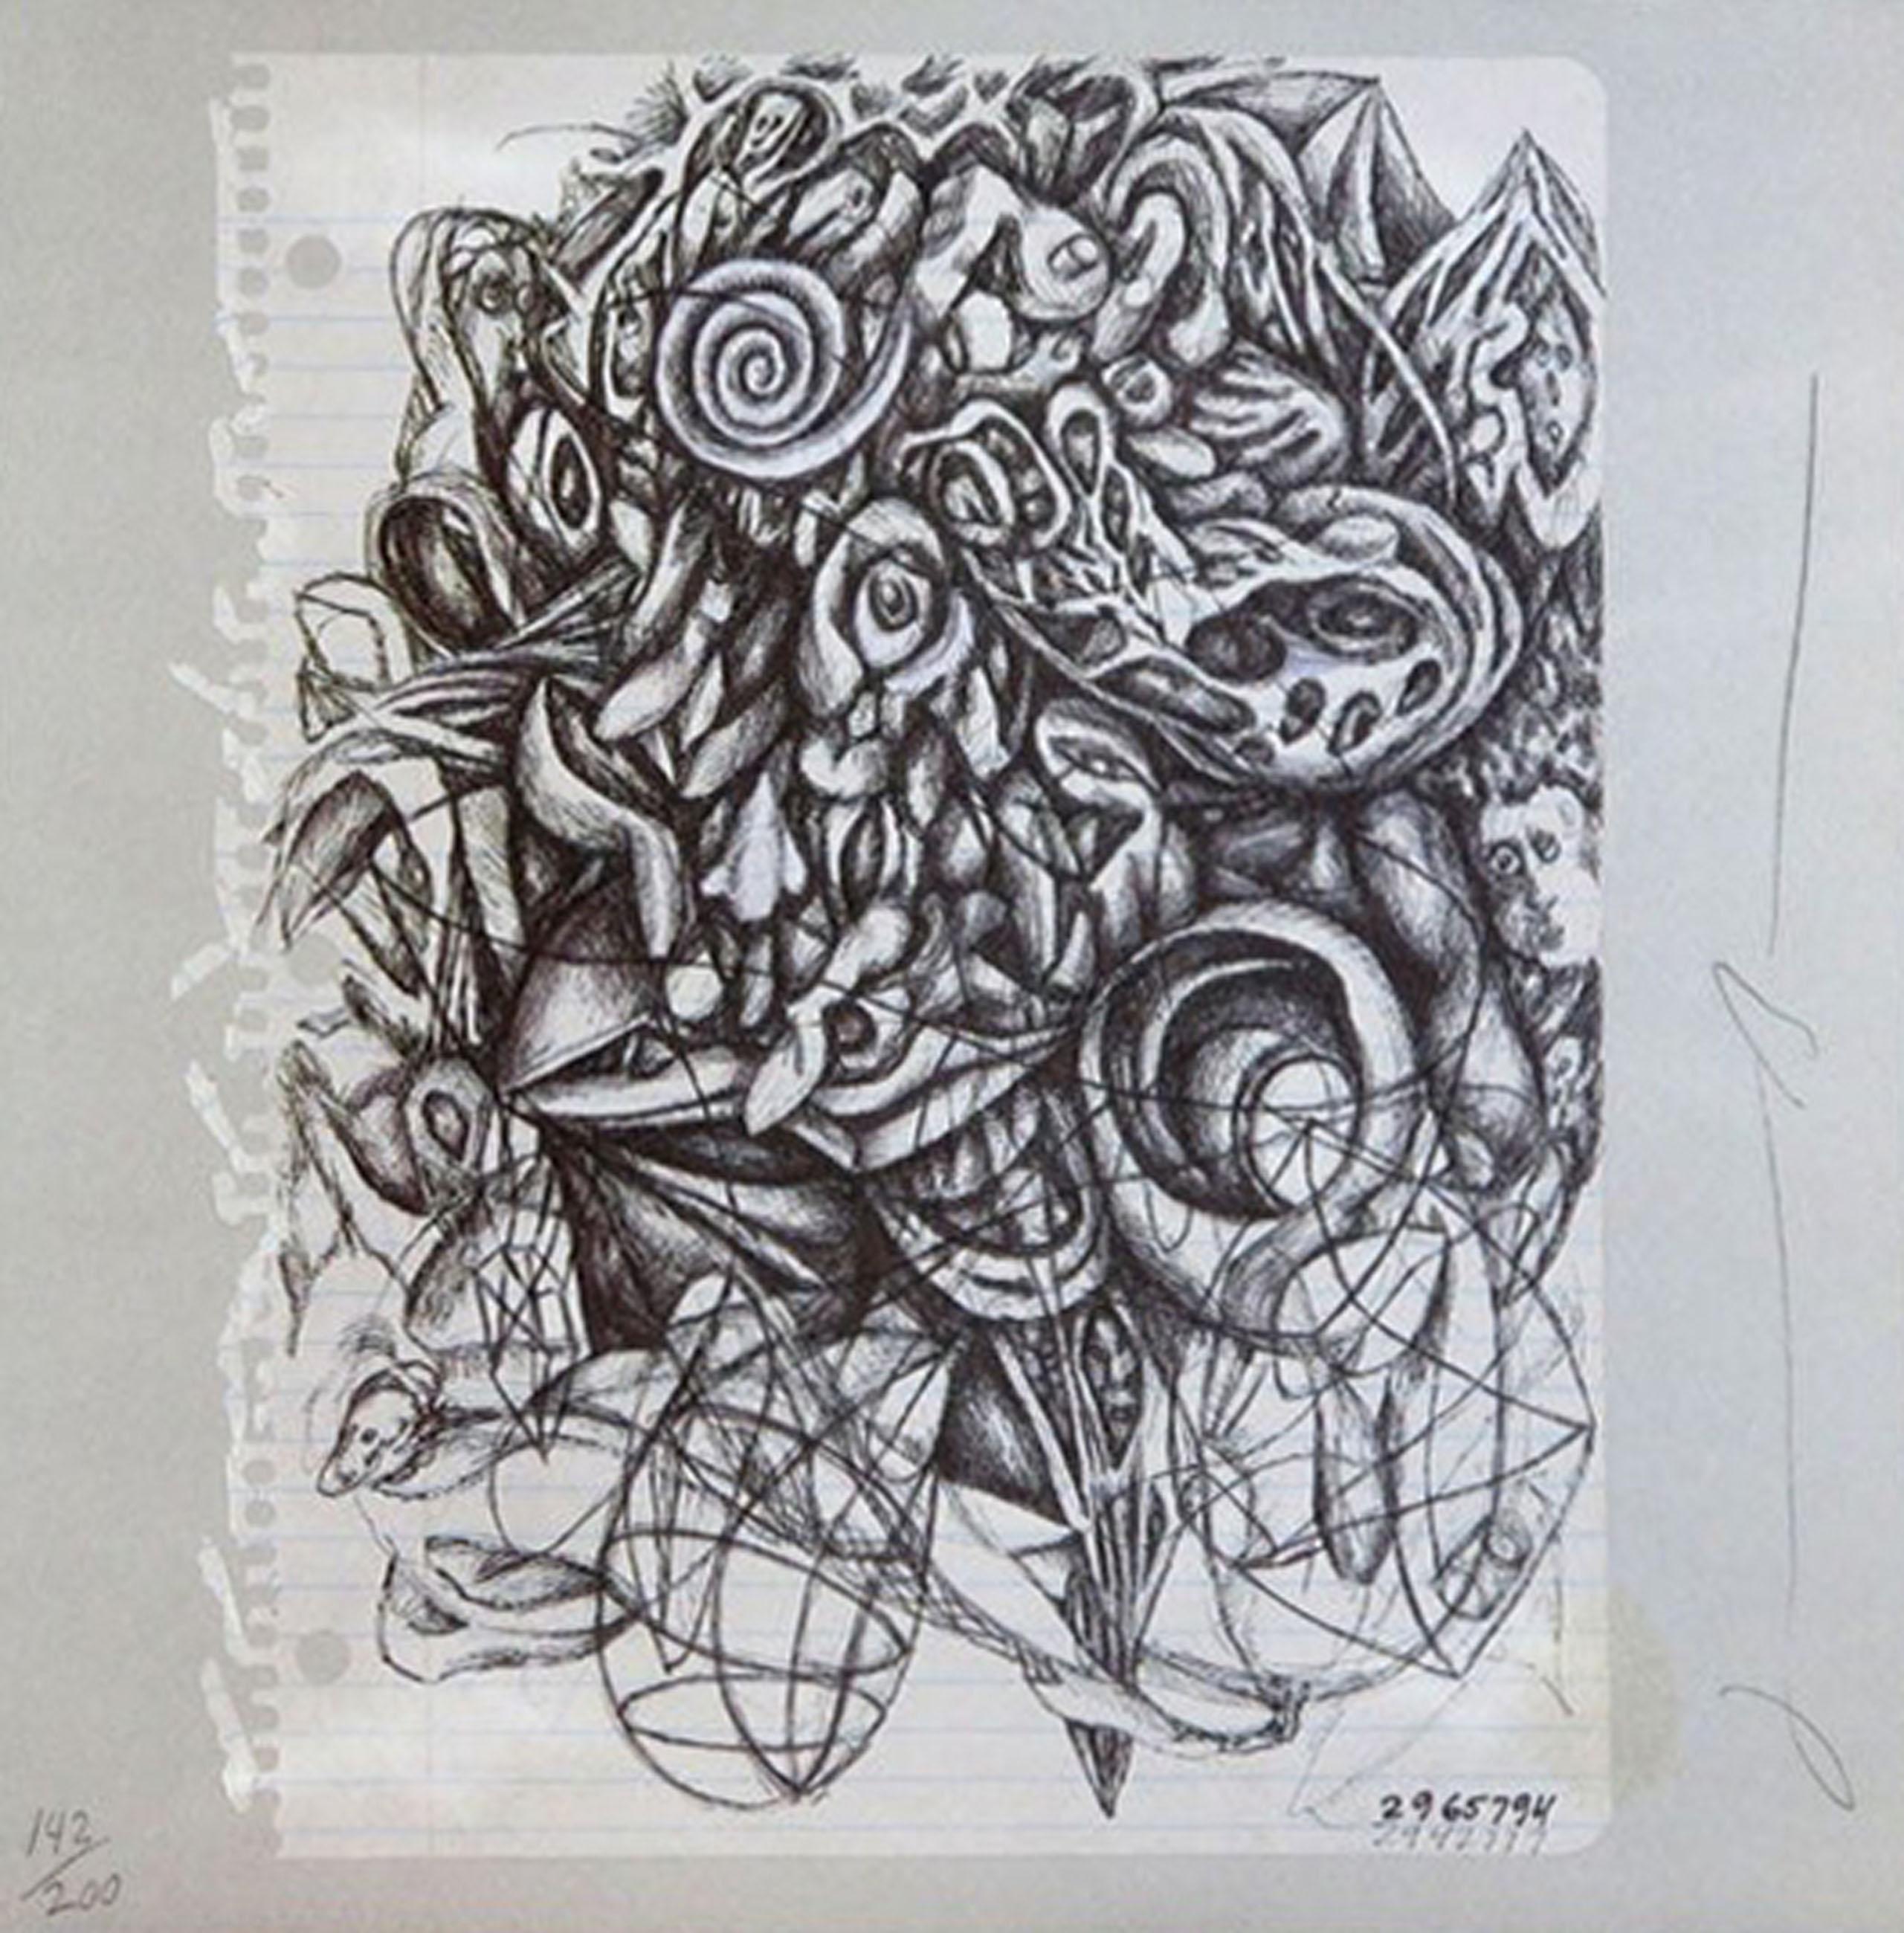 Jonathan Borofsky, Untitled, Offset Lithograph